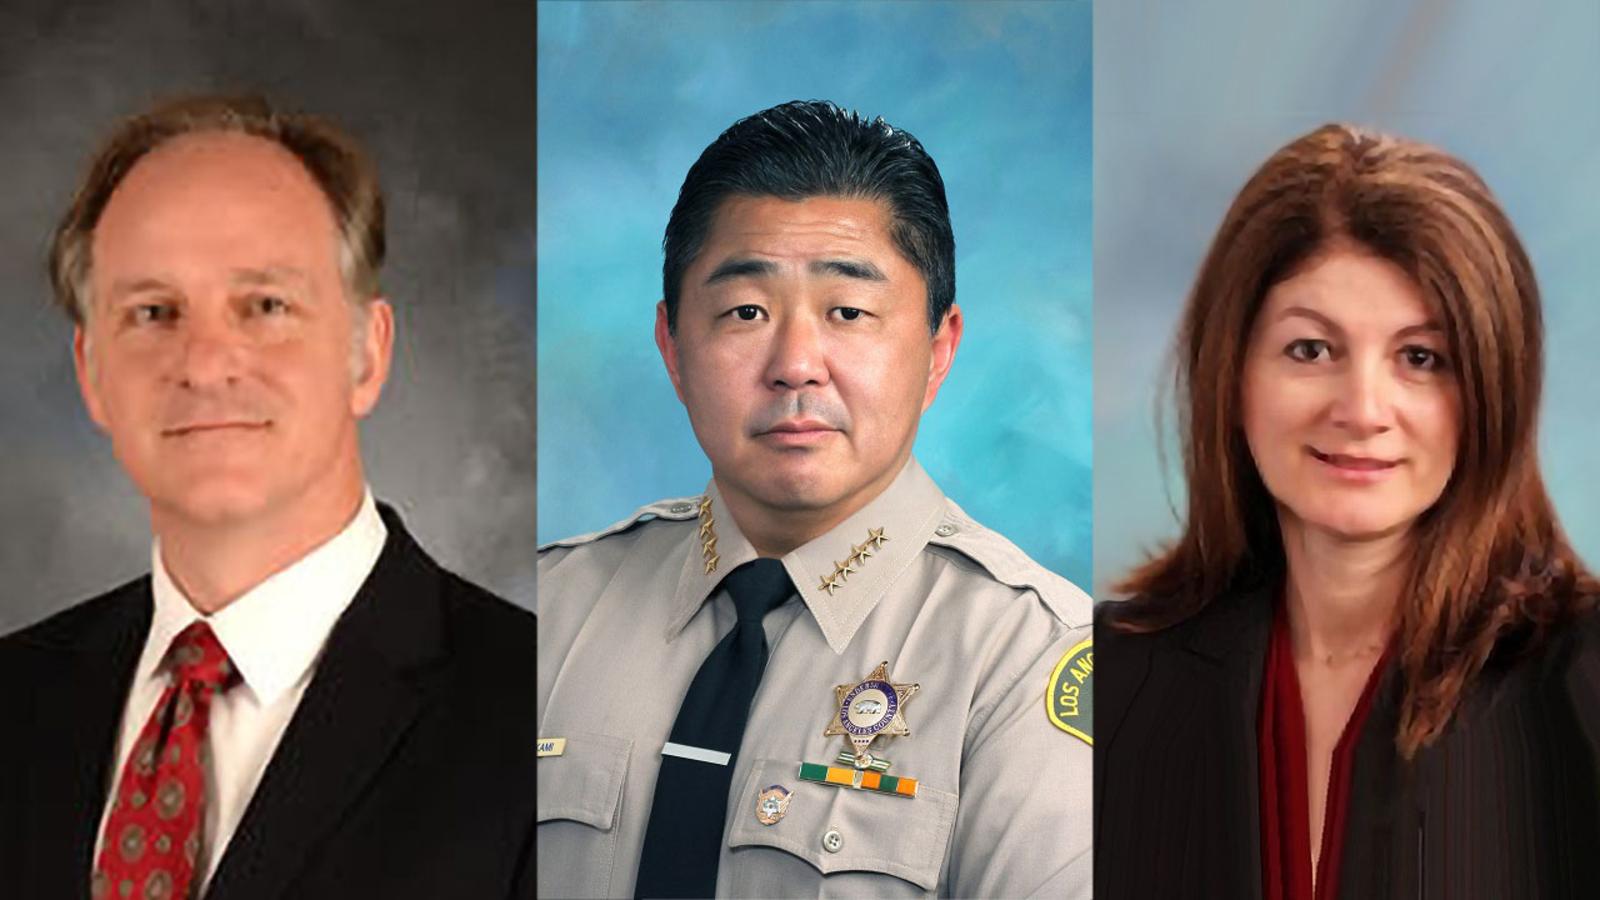 LASD has 'criminal investigation' into its own watchdog